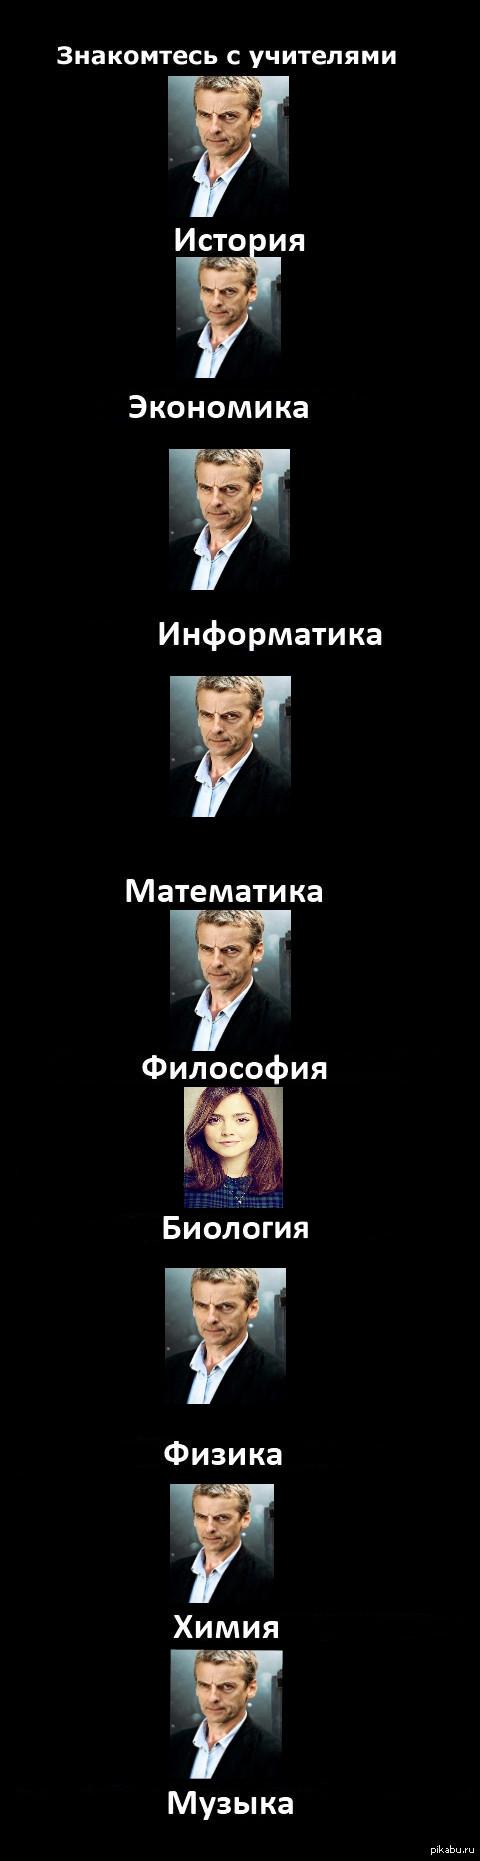 "Школа мечты по мотивам <a href=""http://pikabu.ru/story/shkola_mechtyi__2826441"">http://pikabu.ru/story/_2826441</a>"